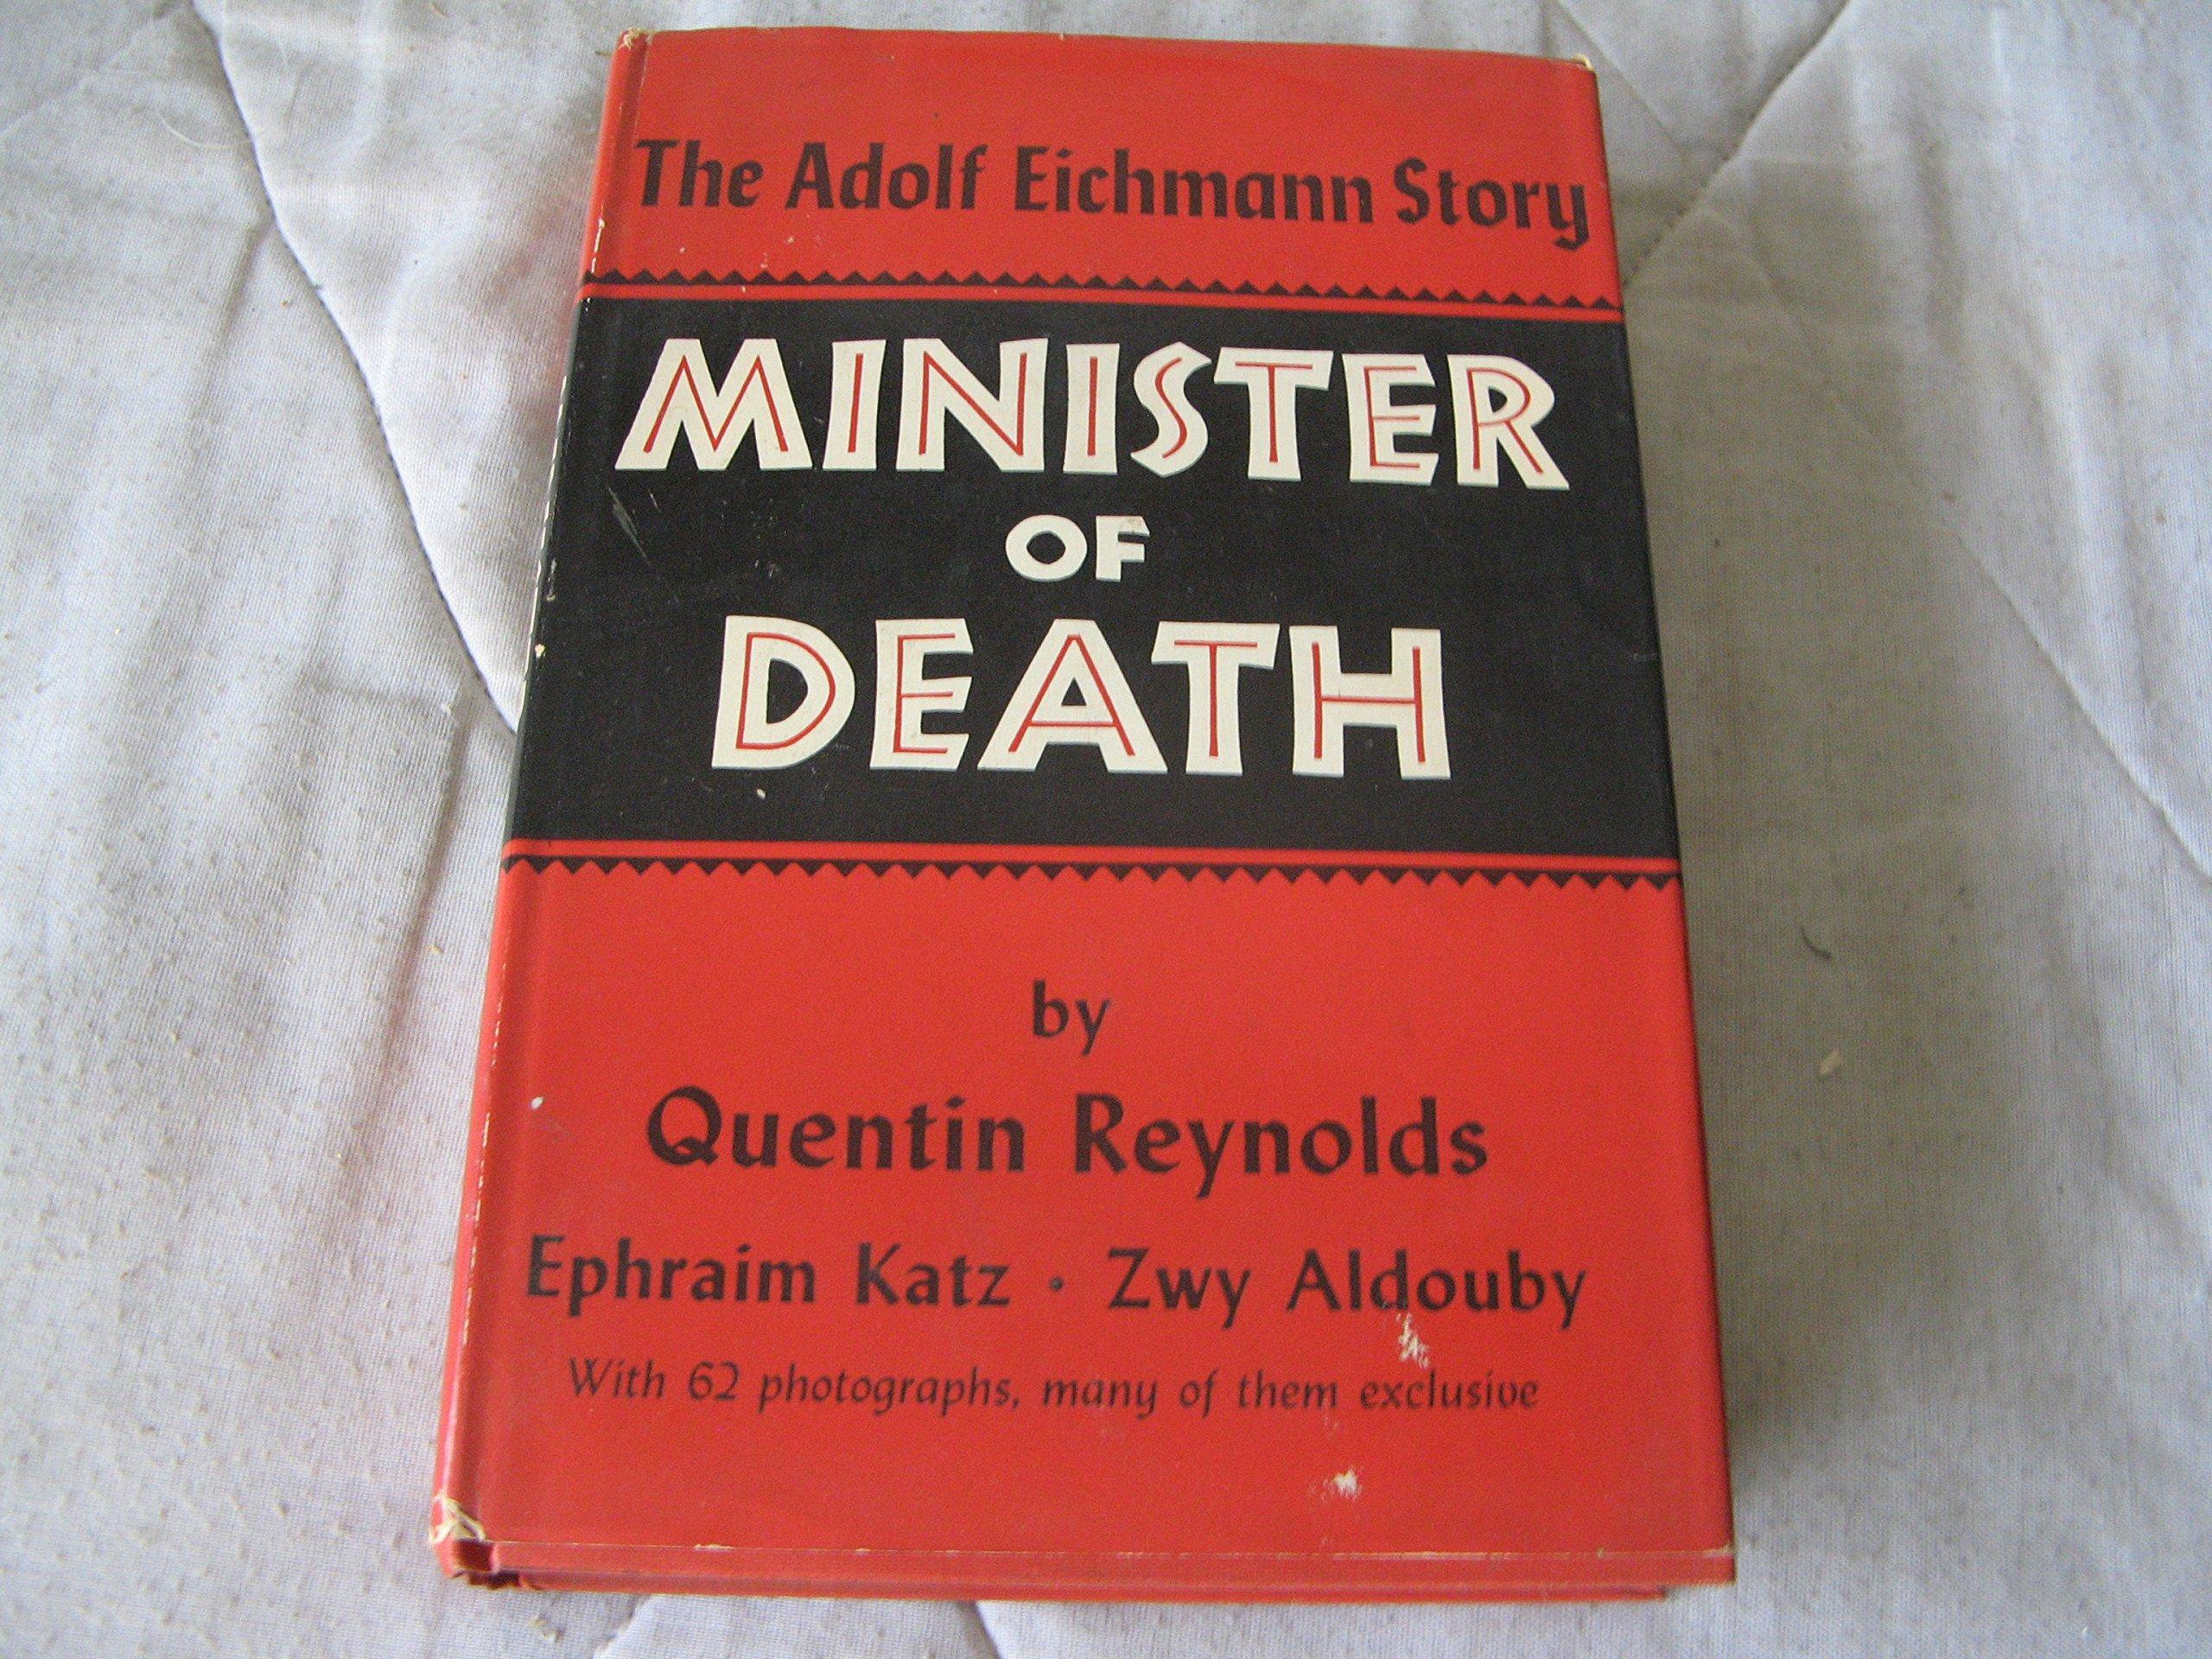 Minister of Death: The Adolf Eichmann Story